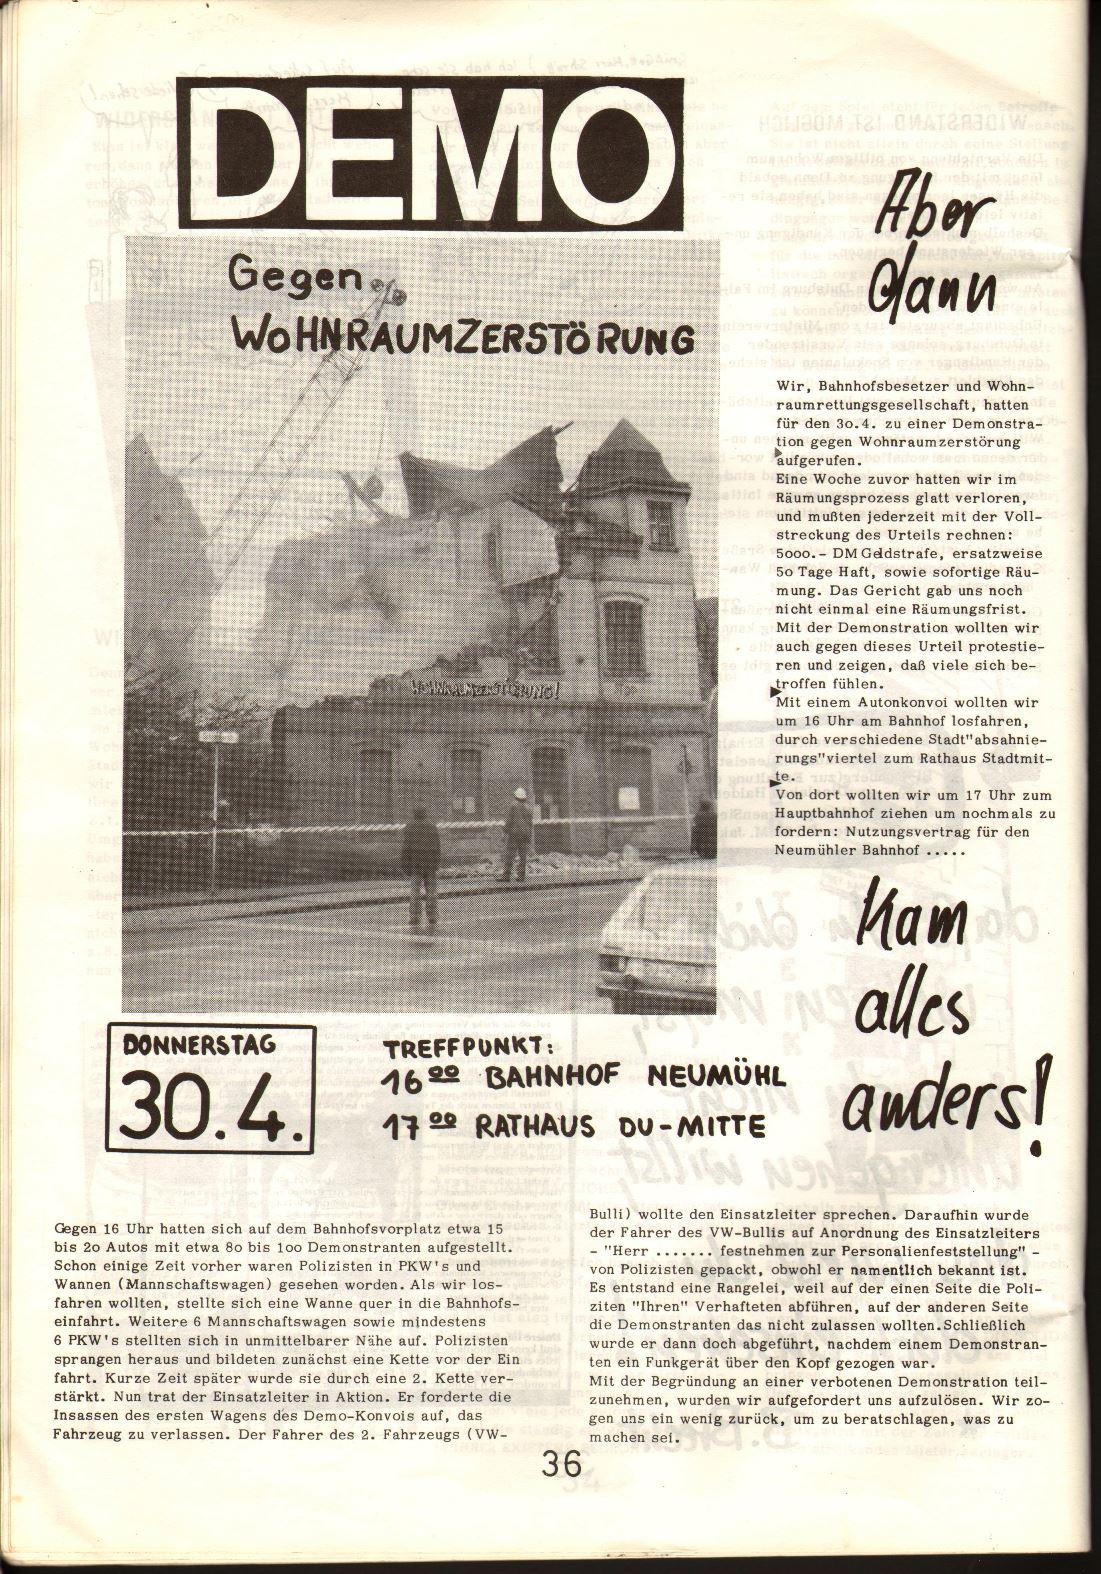 Duisburg_1981_Doku_Neumuehler_Bahnhof_36